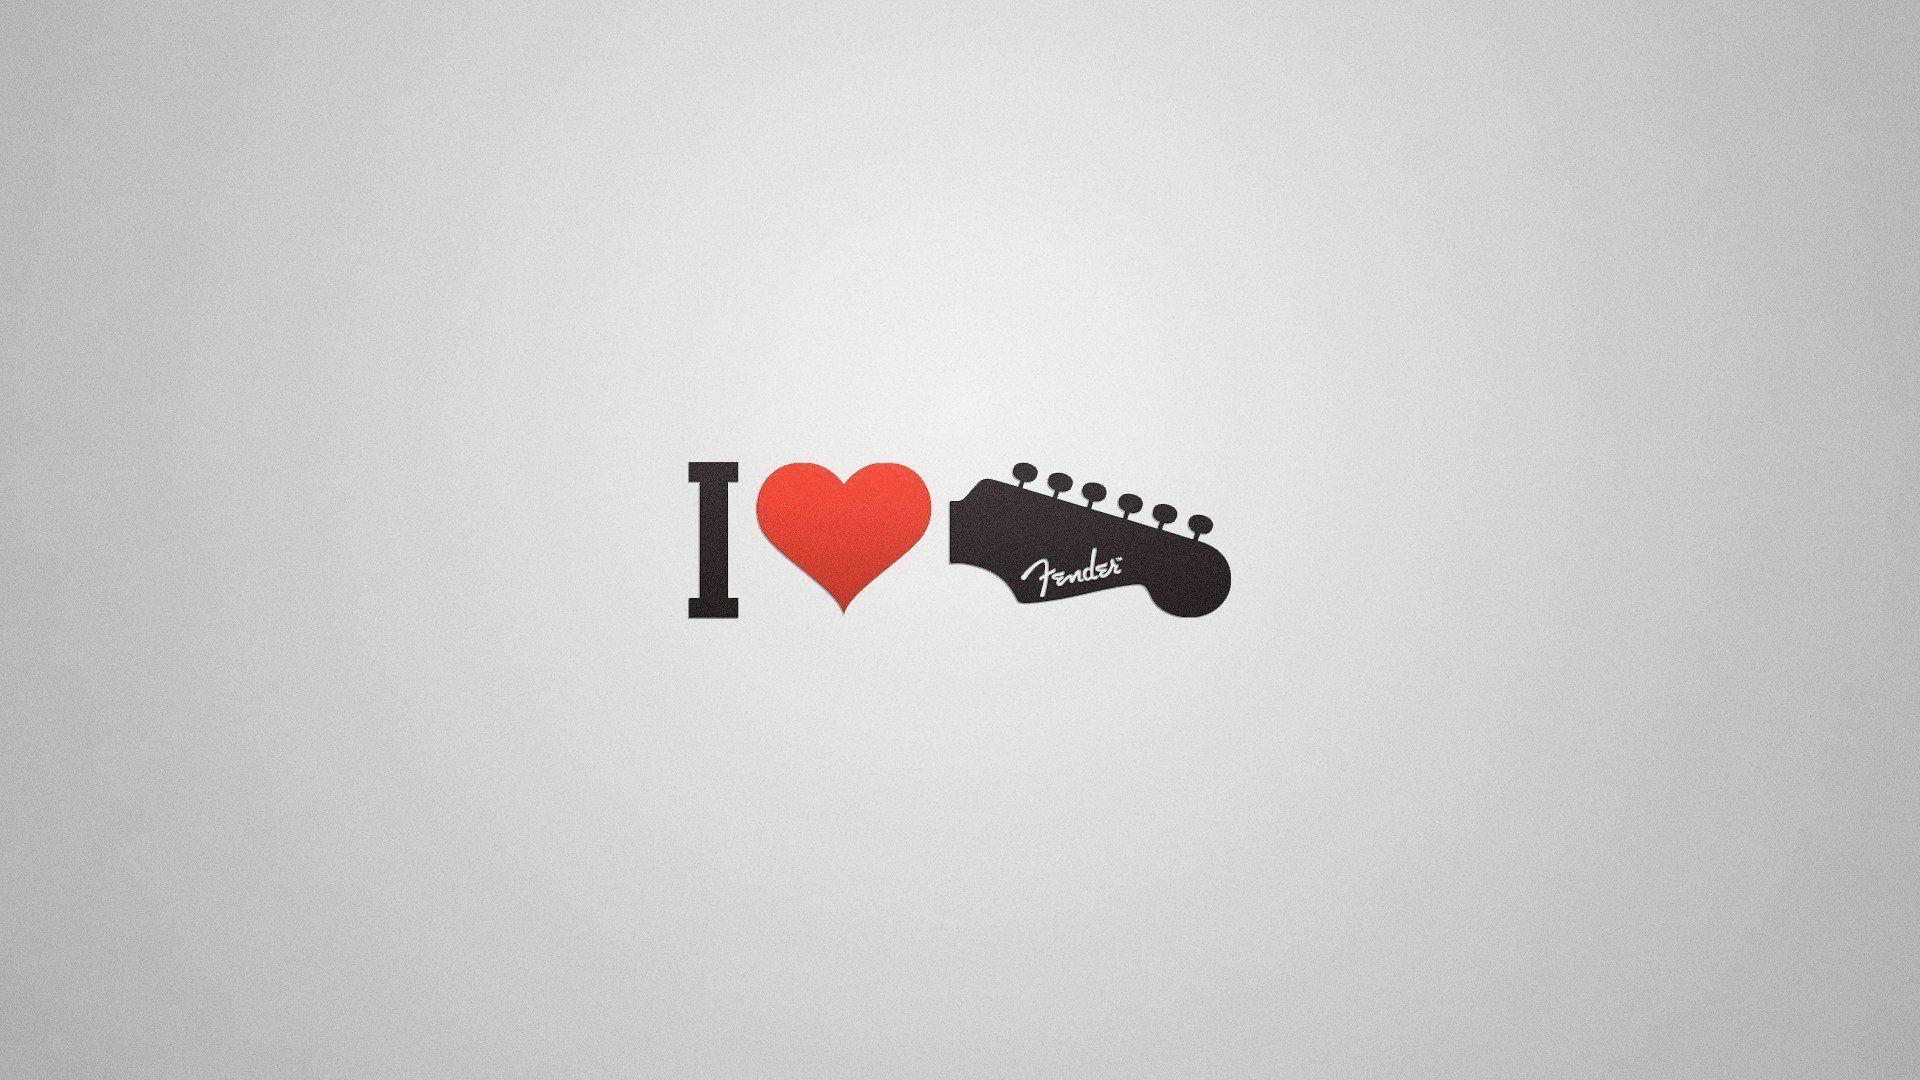 Free Fender Backgrounds